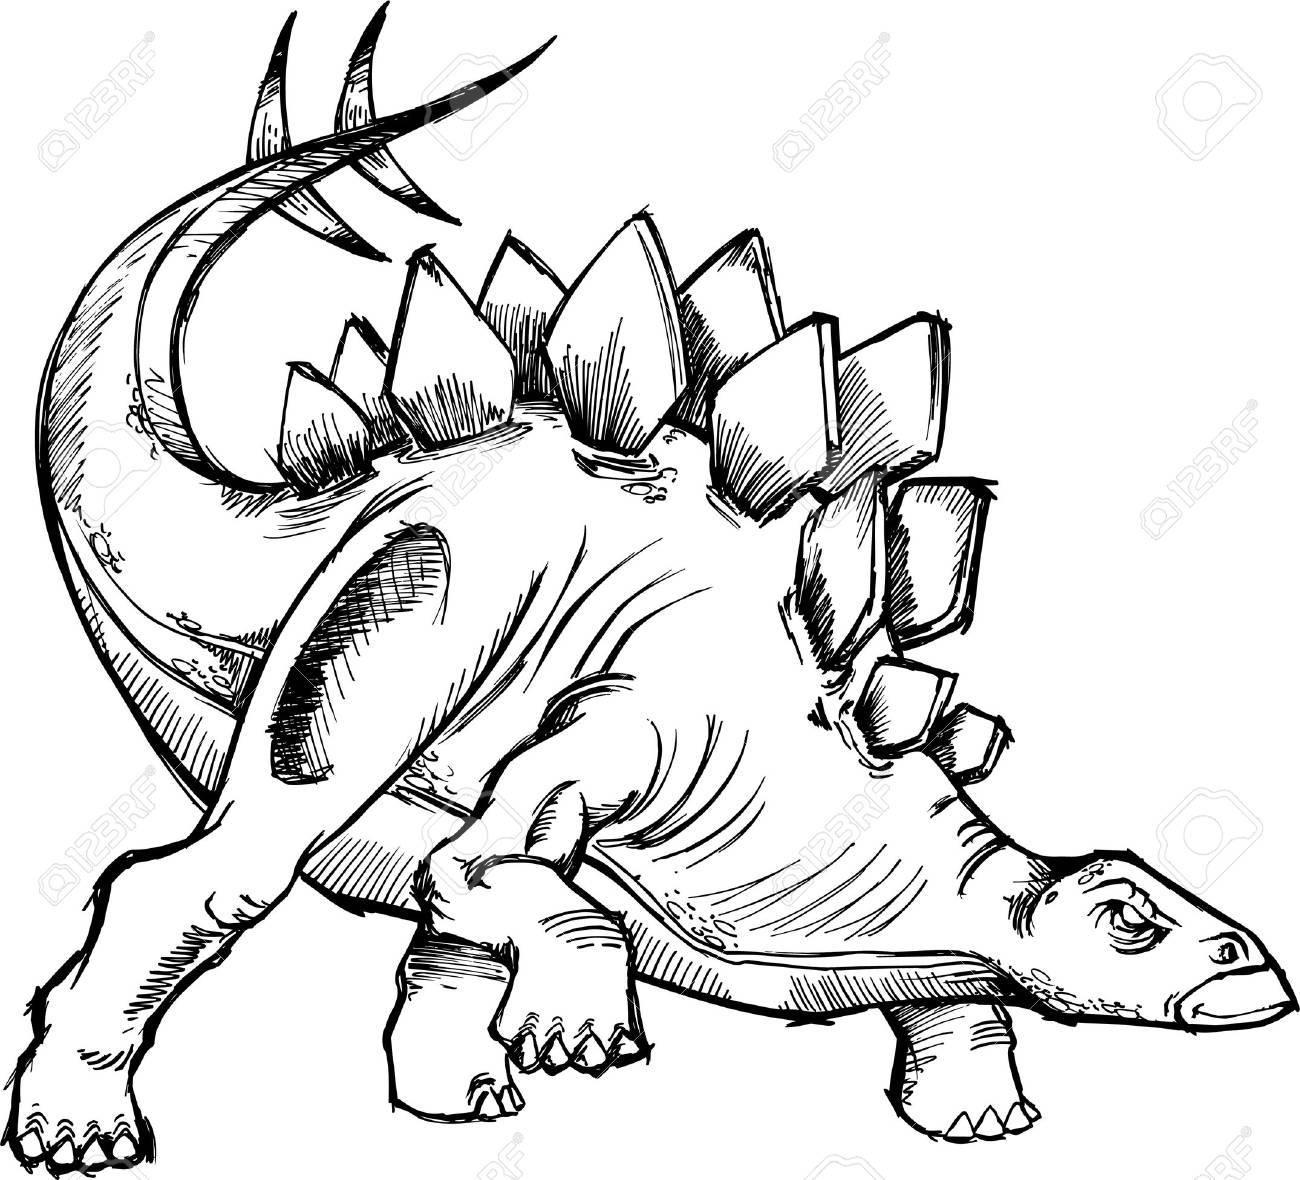 Sketchy Dinosaur Vector Illustraton Stock Vector - 2514727